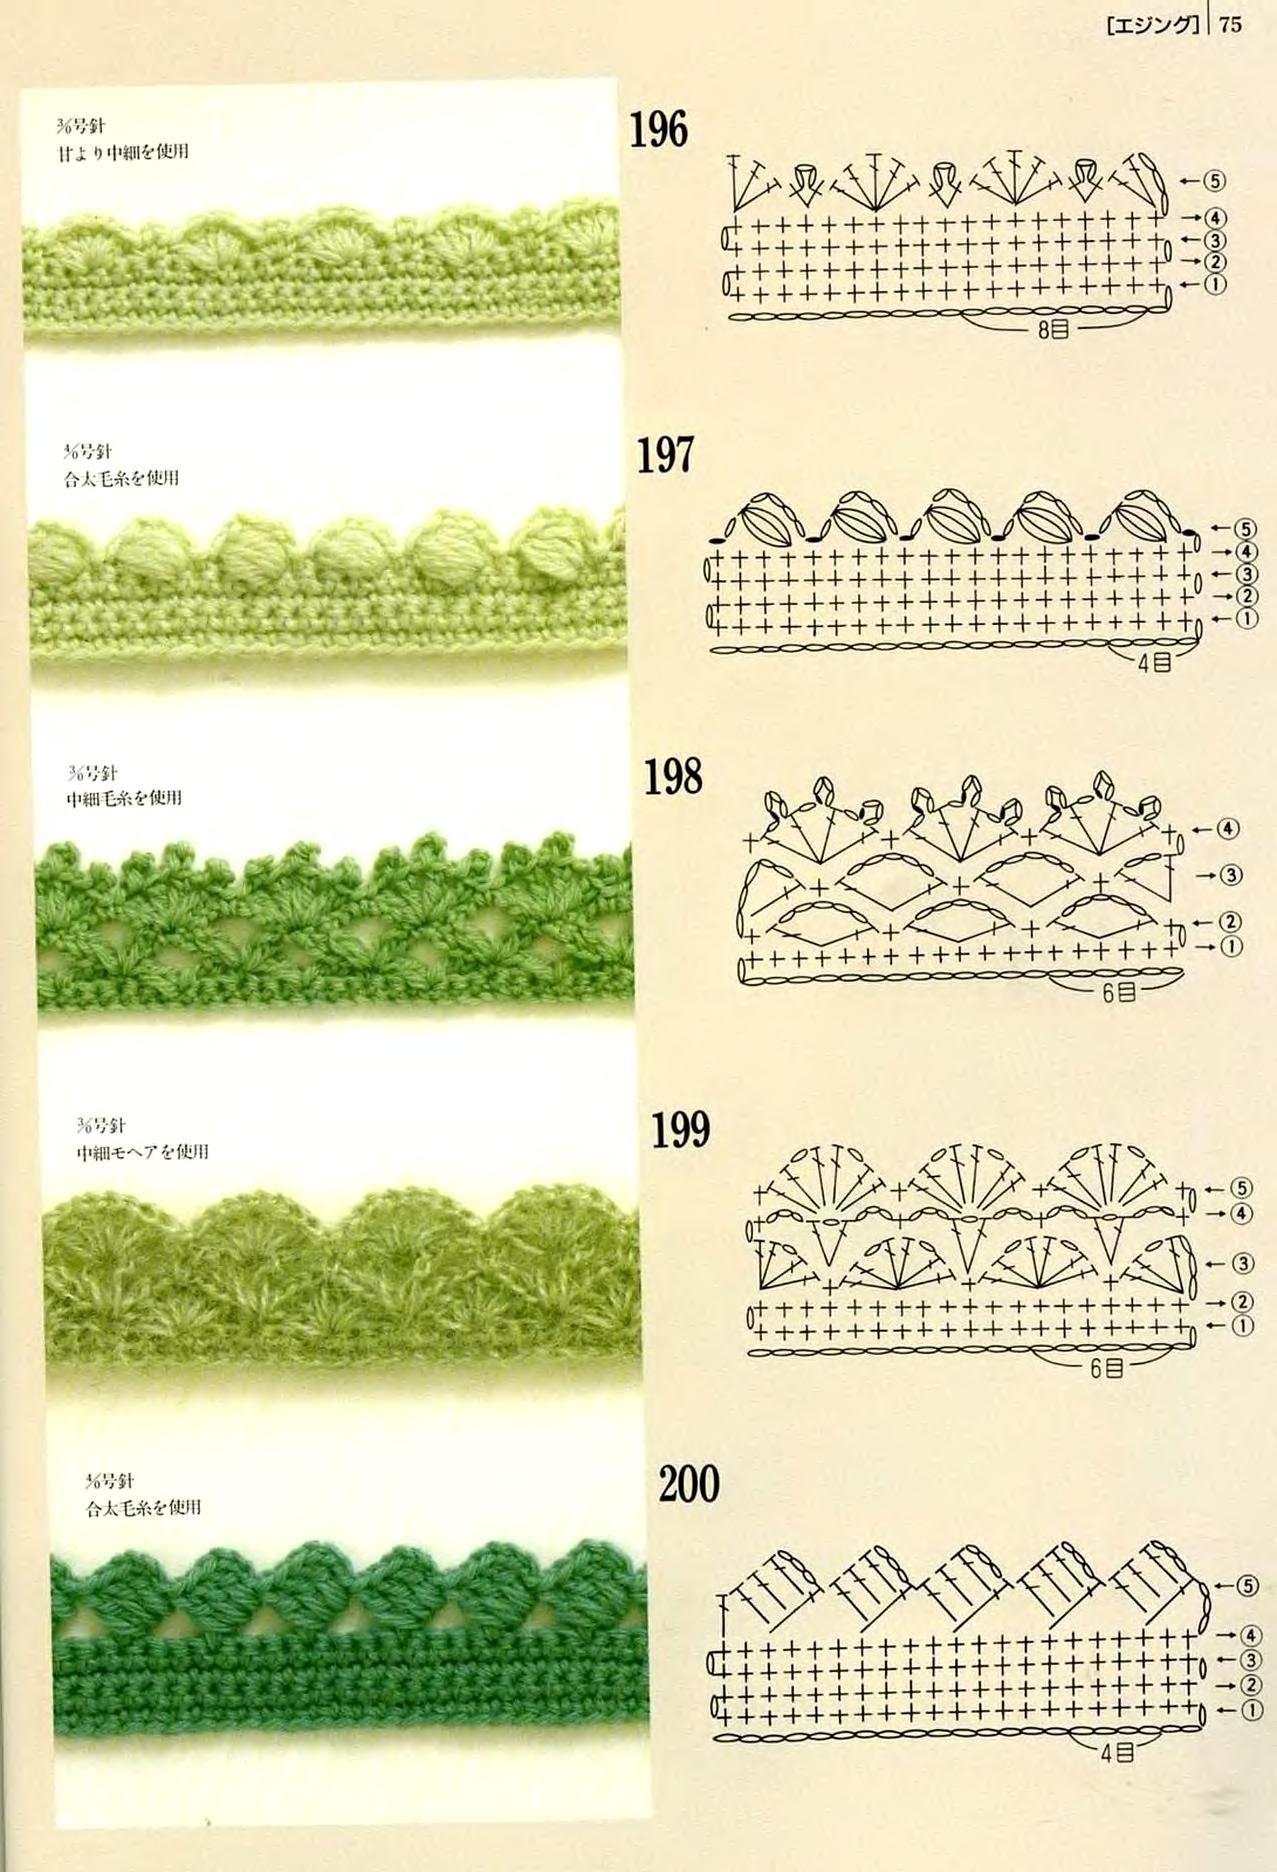 Uℓviỿỿa S. ♡ 2 | ♔ Knitting & Felting | Pinterest | Bordüren ...